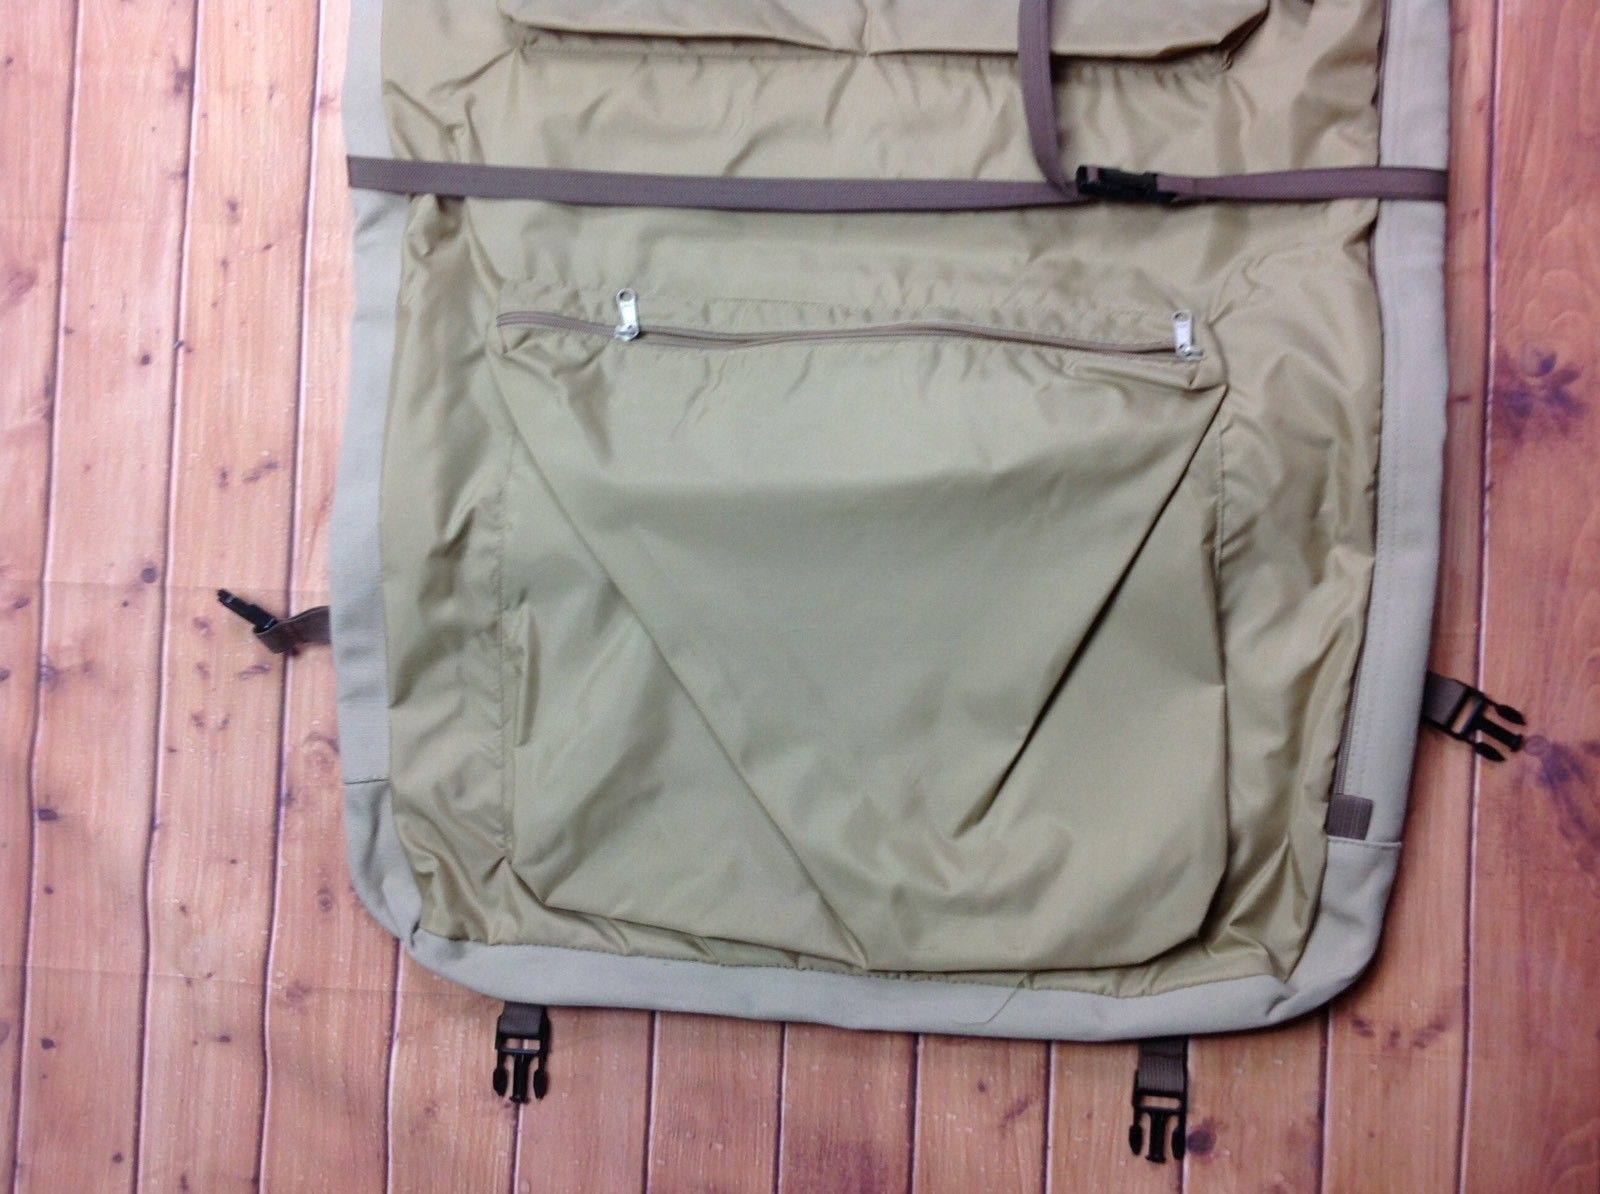 d95906a8ce Eddie Bauer Ford Tan Canvas Folding Hanging Suit Garment Bag Dress Luggage  Beige